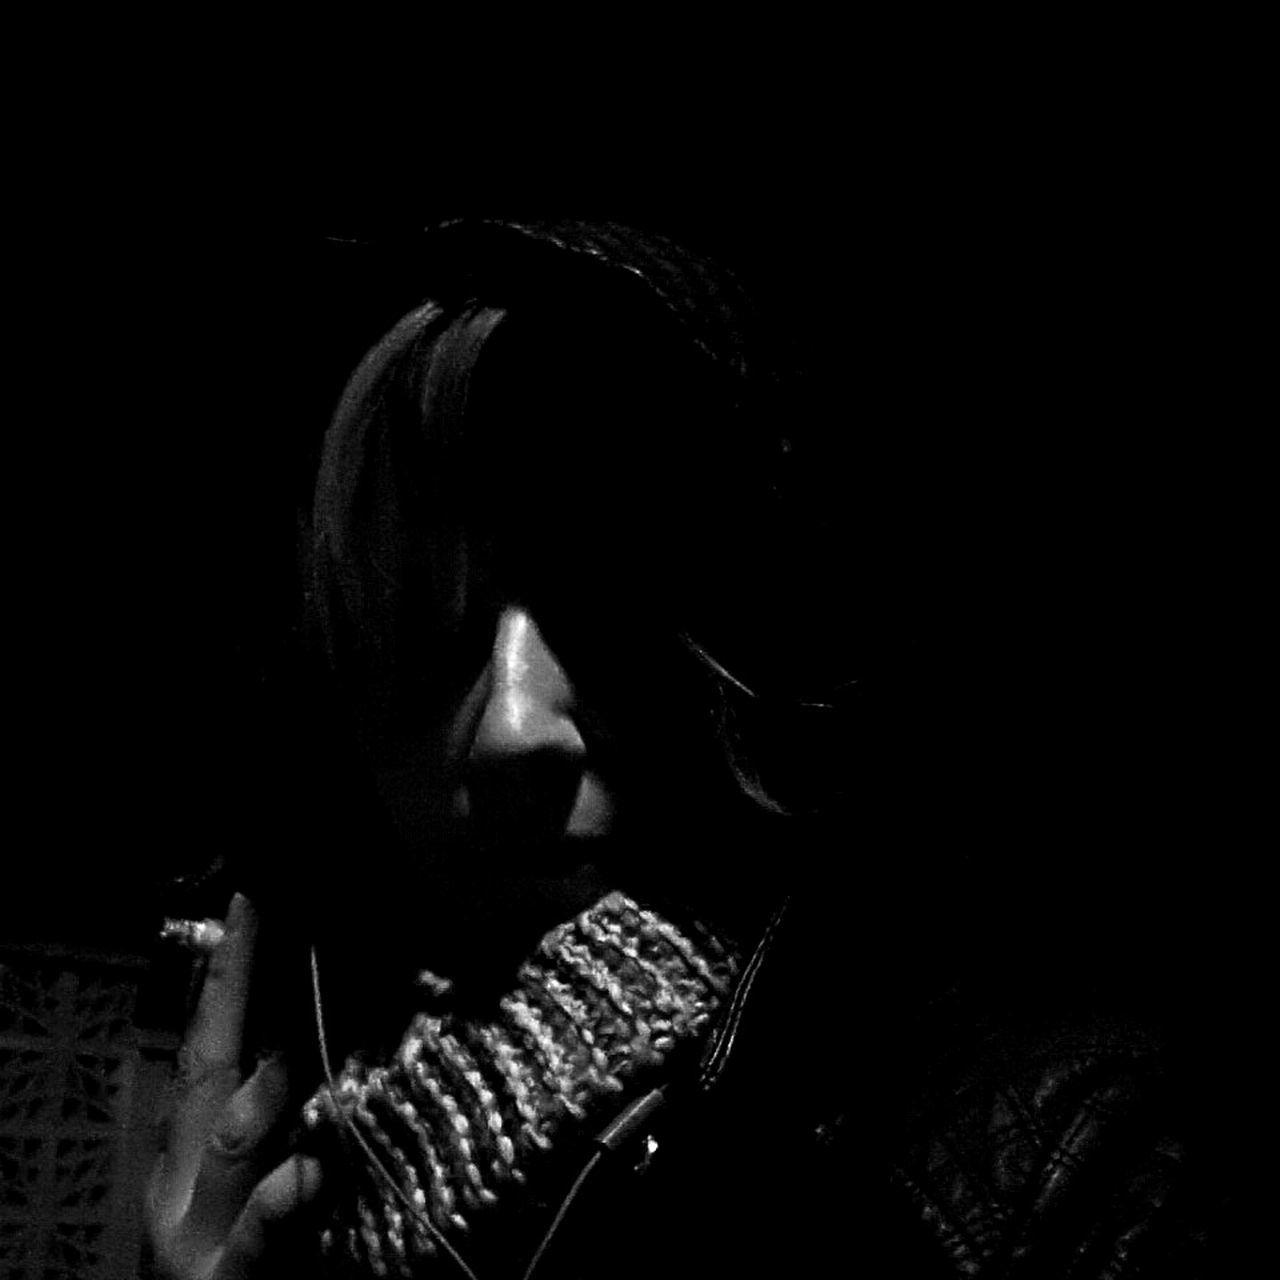 One Woman Only Black Background Night Cigarette Time Black & White Portrait Portrait Of A Woman Black And White Portrait Prague Czech Republic Autumn 3XSPUnity